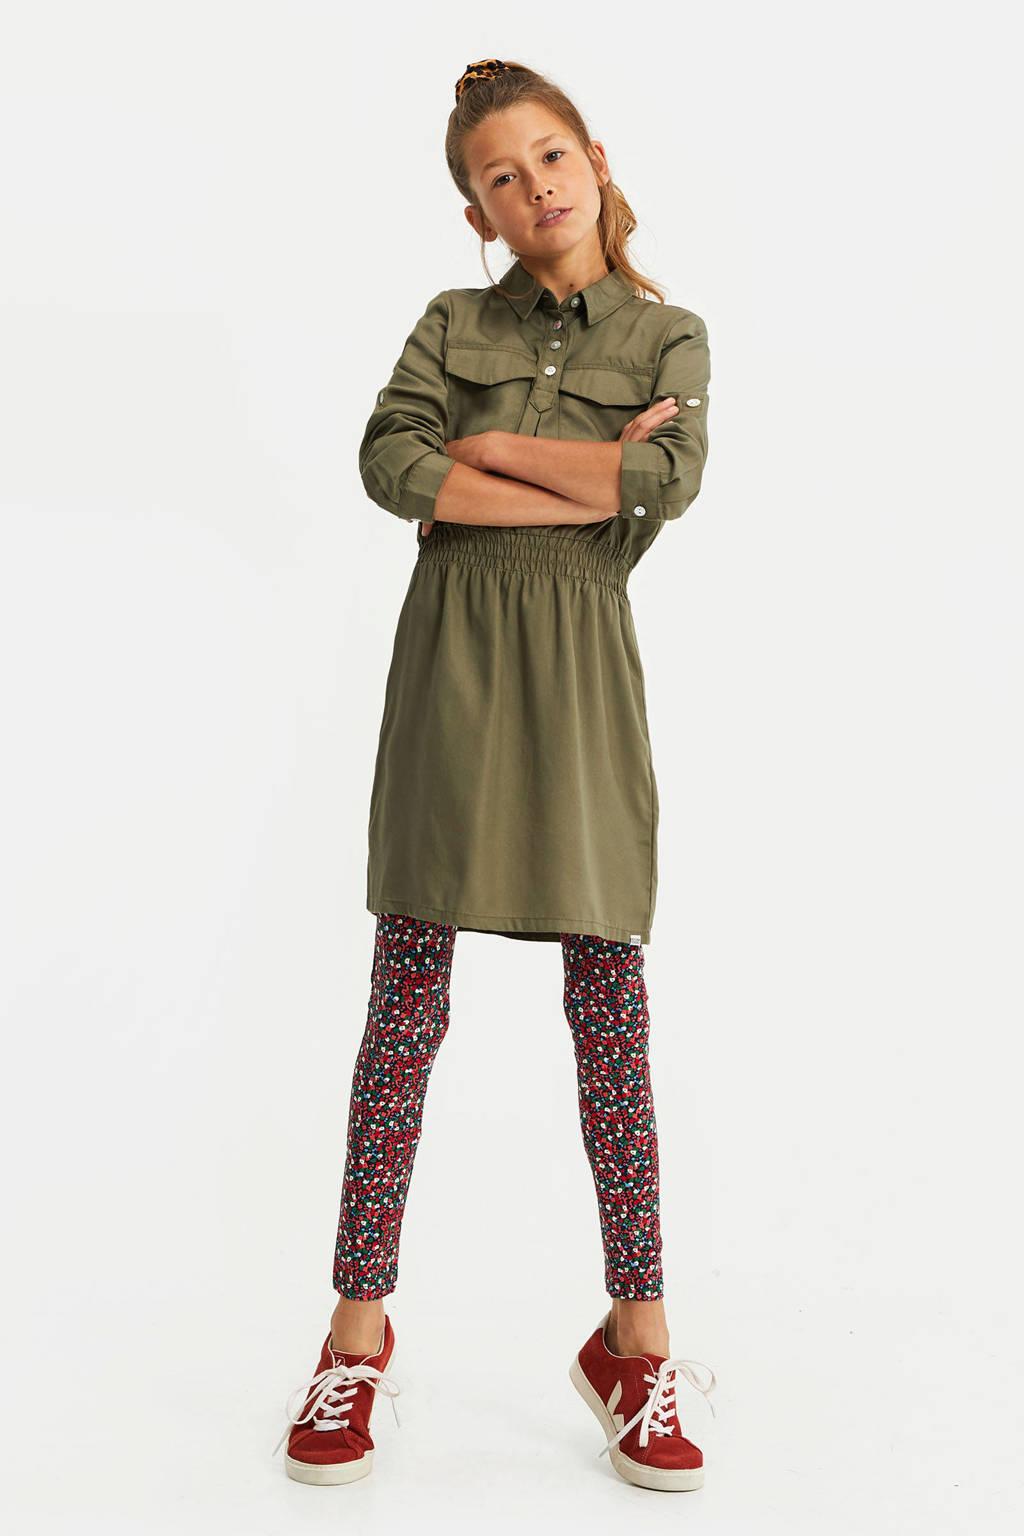 WE Fashion gebloemde legging donkerblauw/rood/groen, Donkerblauw/rood/groen